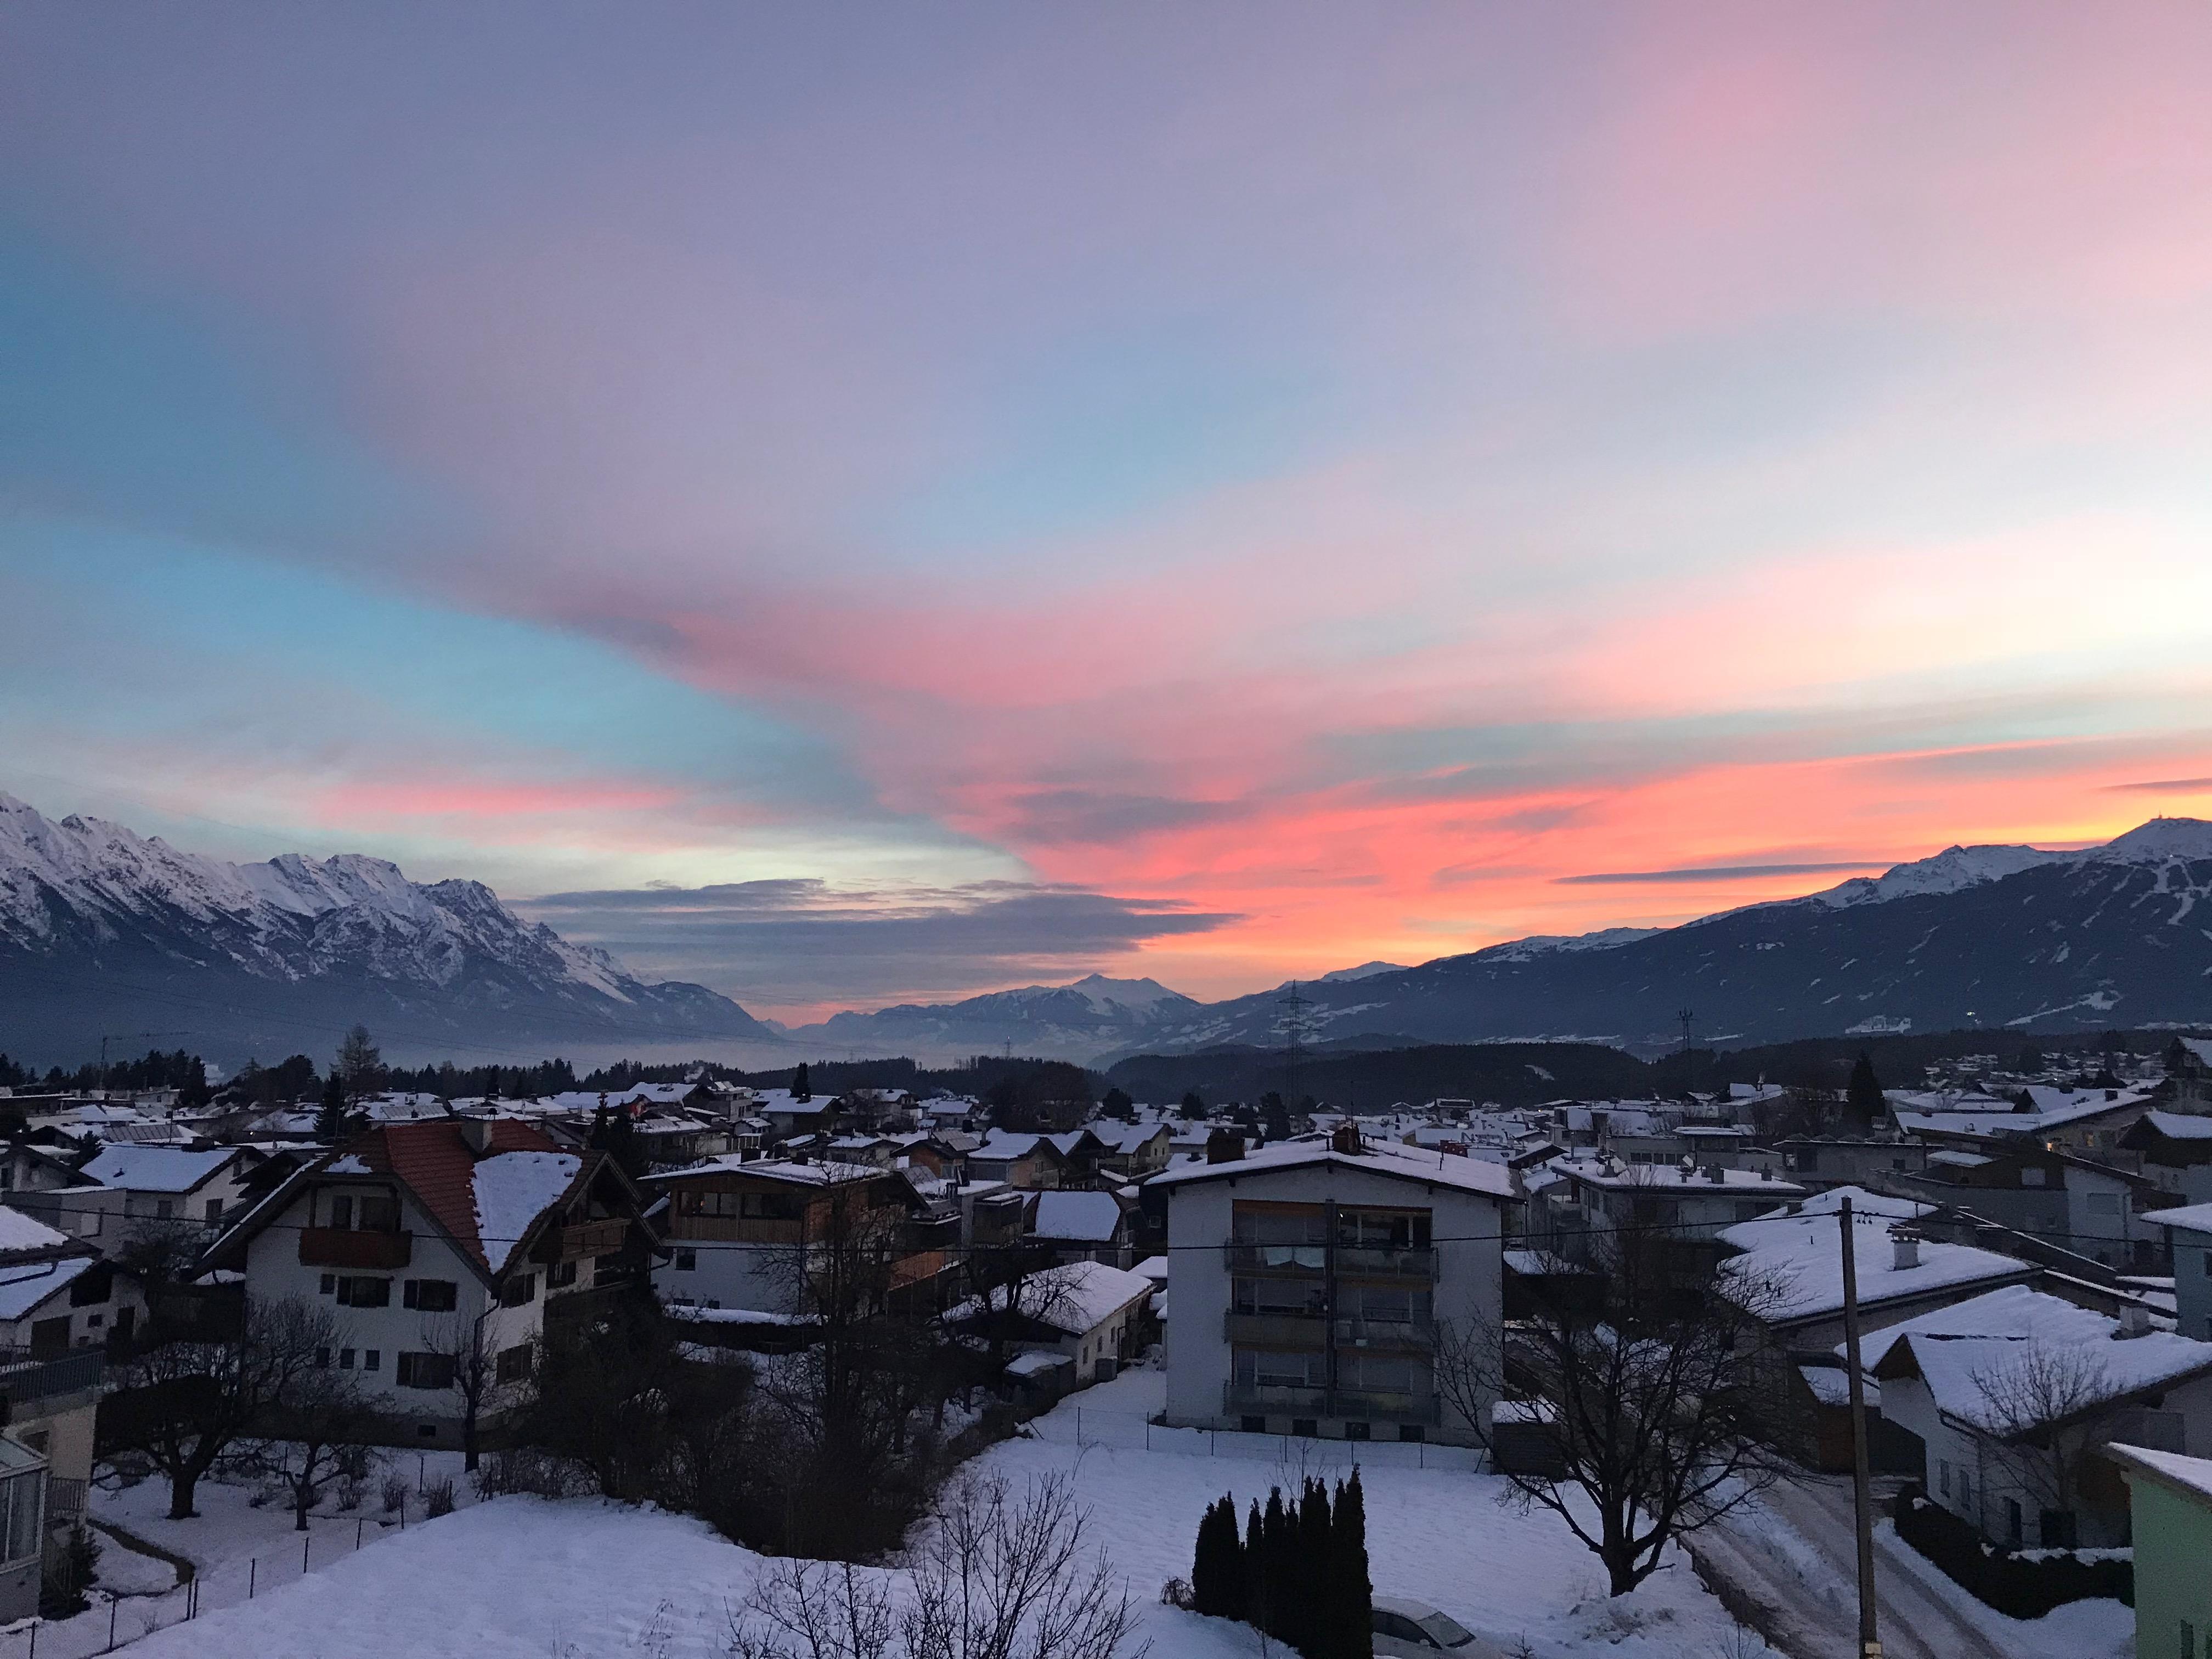 Sunrise from Alp Art Hotel